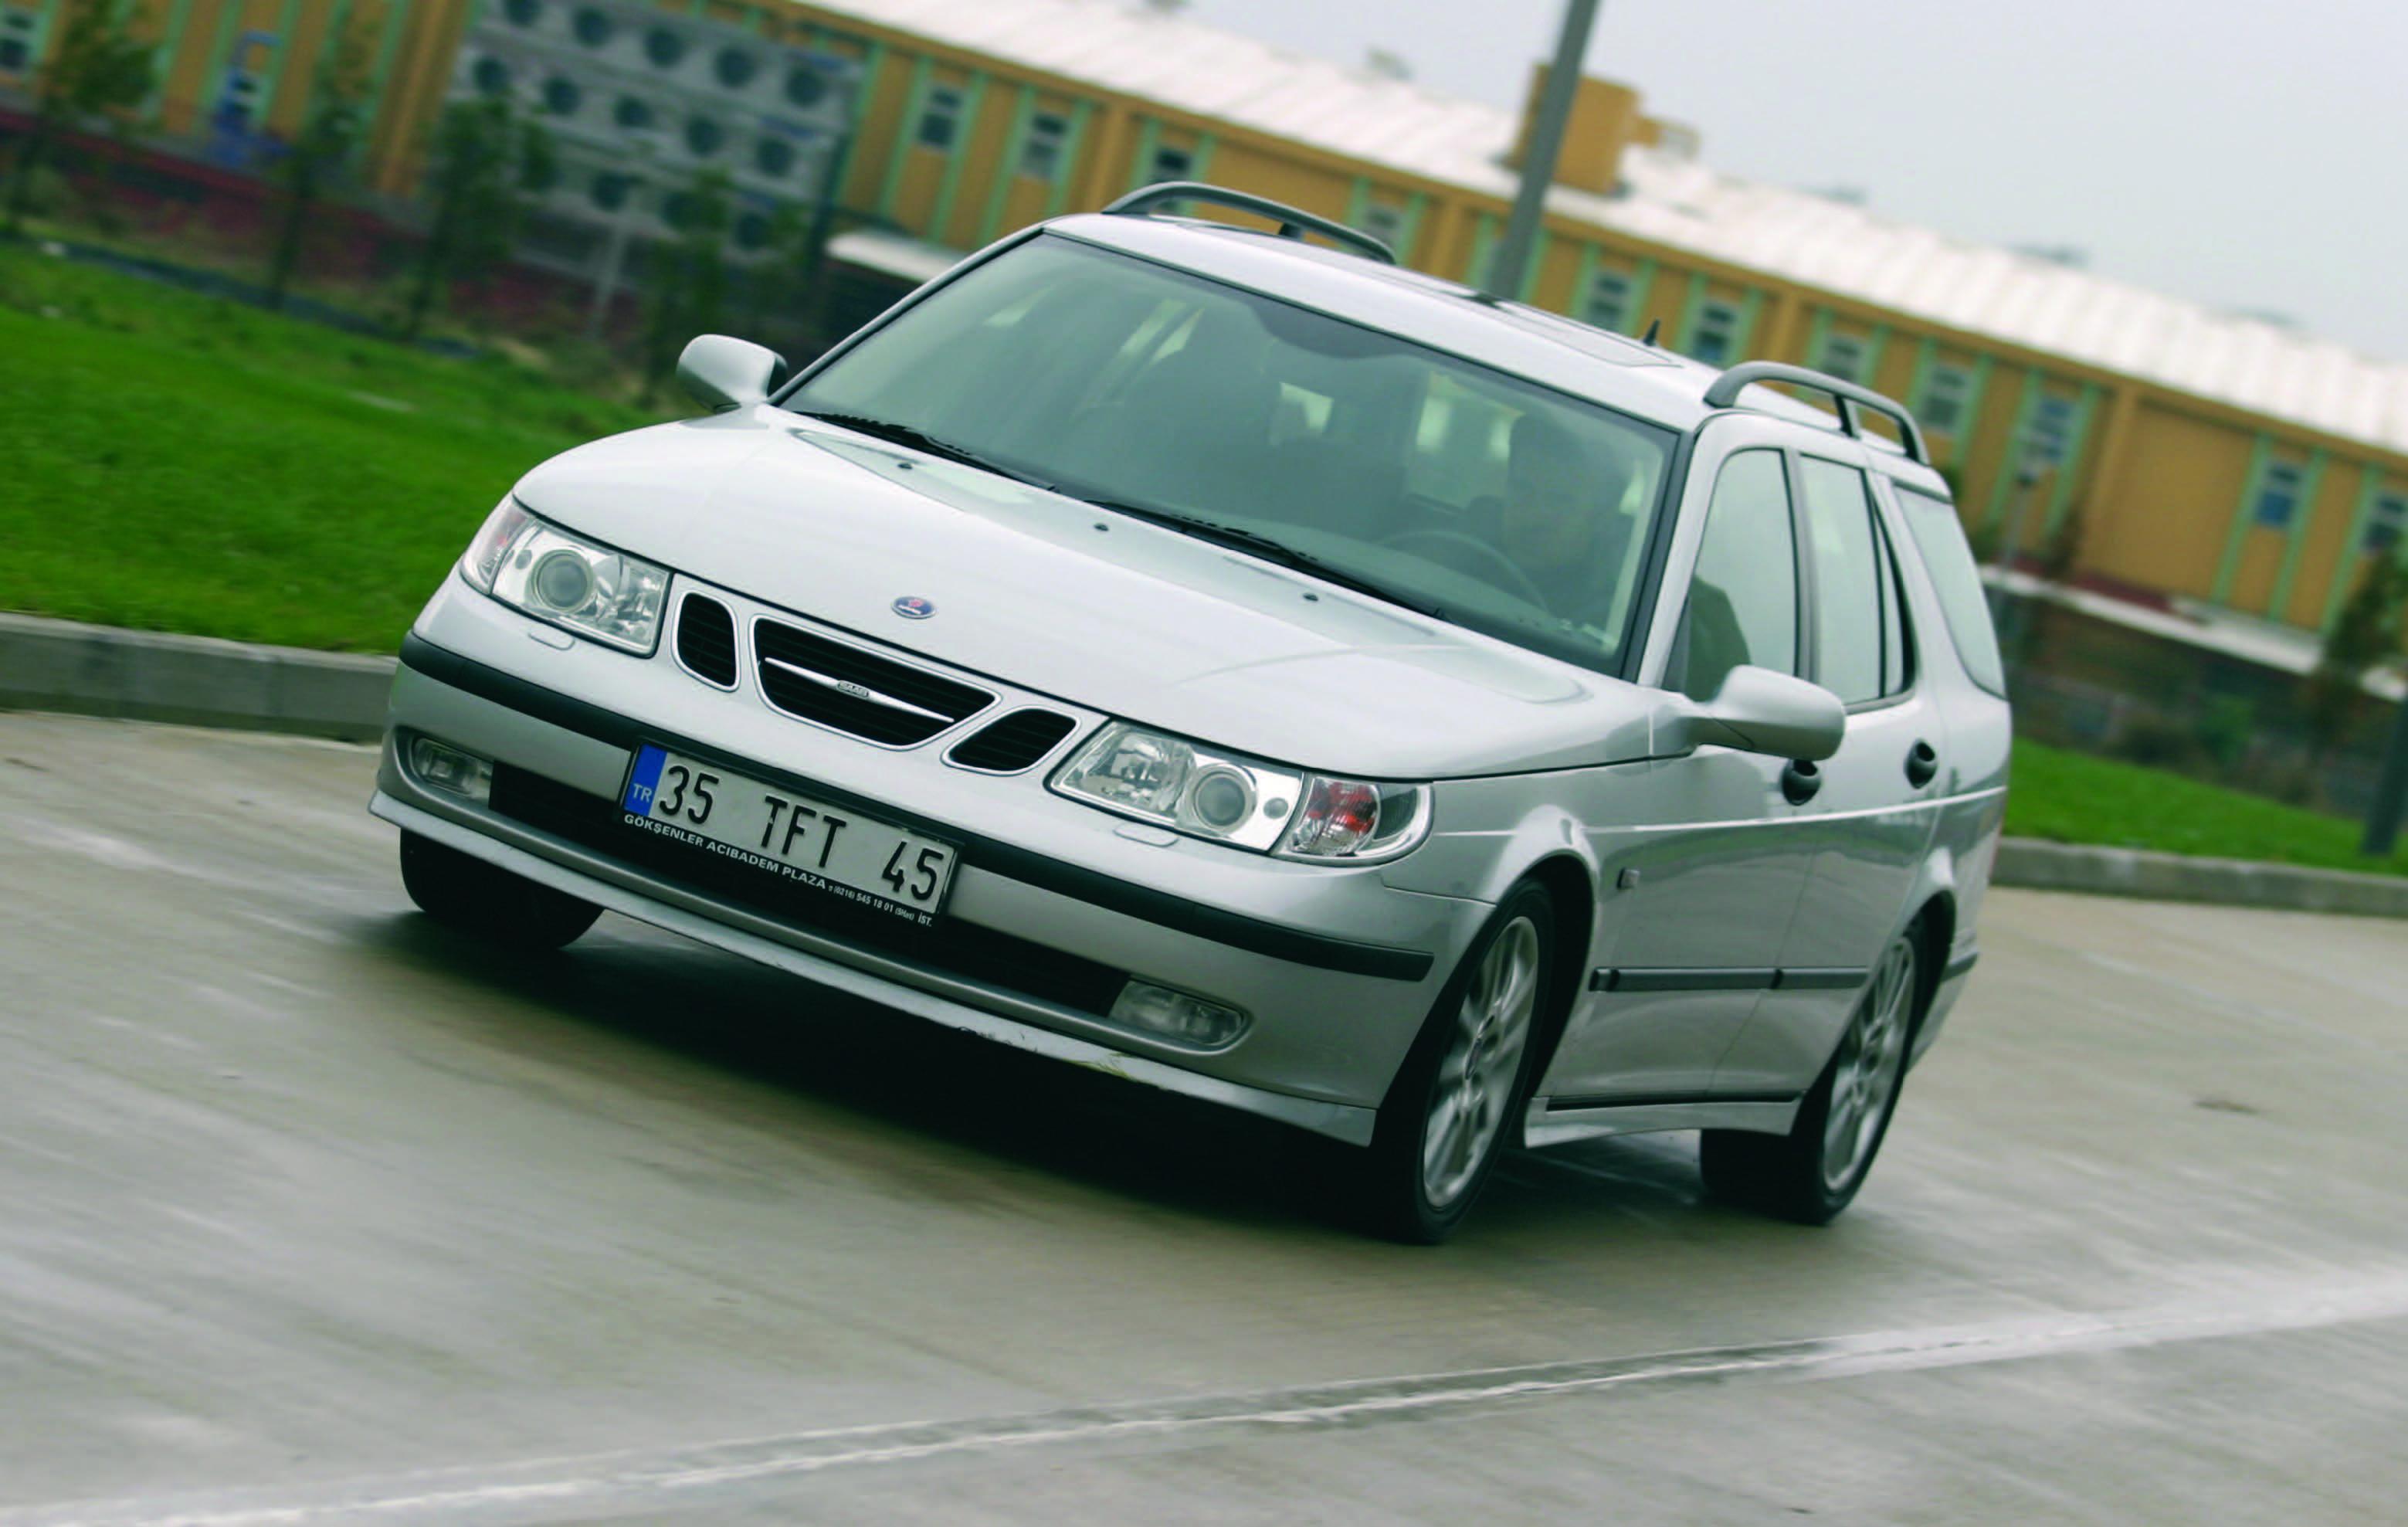 1478788778907 - Saab 9-5 Sport Wagon 2.3 Aero - Test